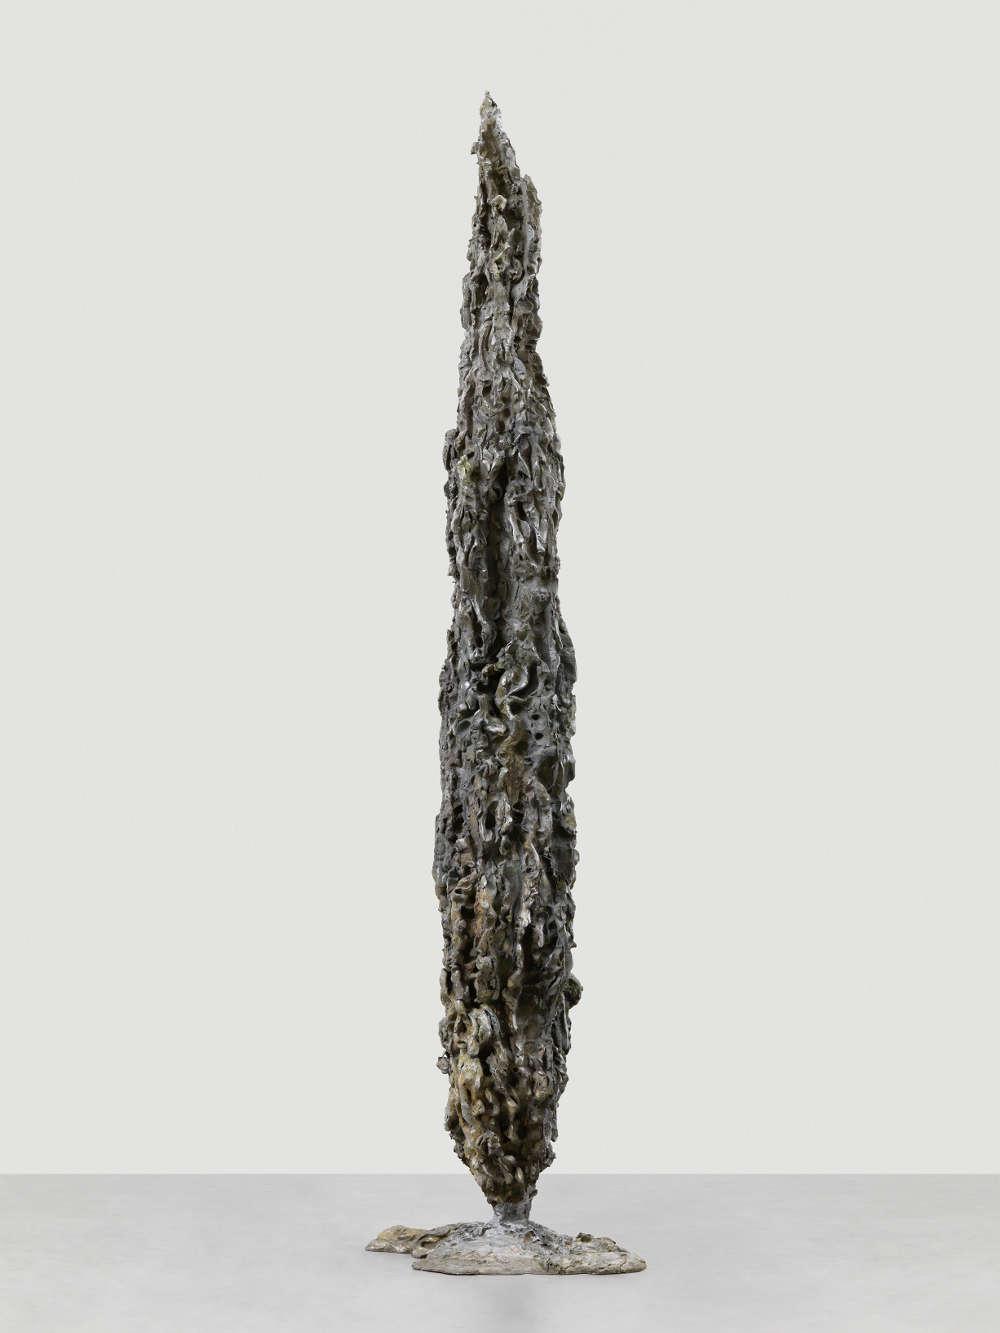 Jean-Marie Appriou, Cypress (Shadow), 2018. Cast aluminum 265 x 74 x 54 cm / 104 3/8 x 29 1/8 x 21 1/4 in © Jean-Marie Appriou. Courtesy the artist and Galerie Eva Presenhuber, Zurich / New York